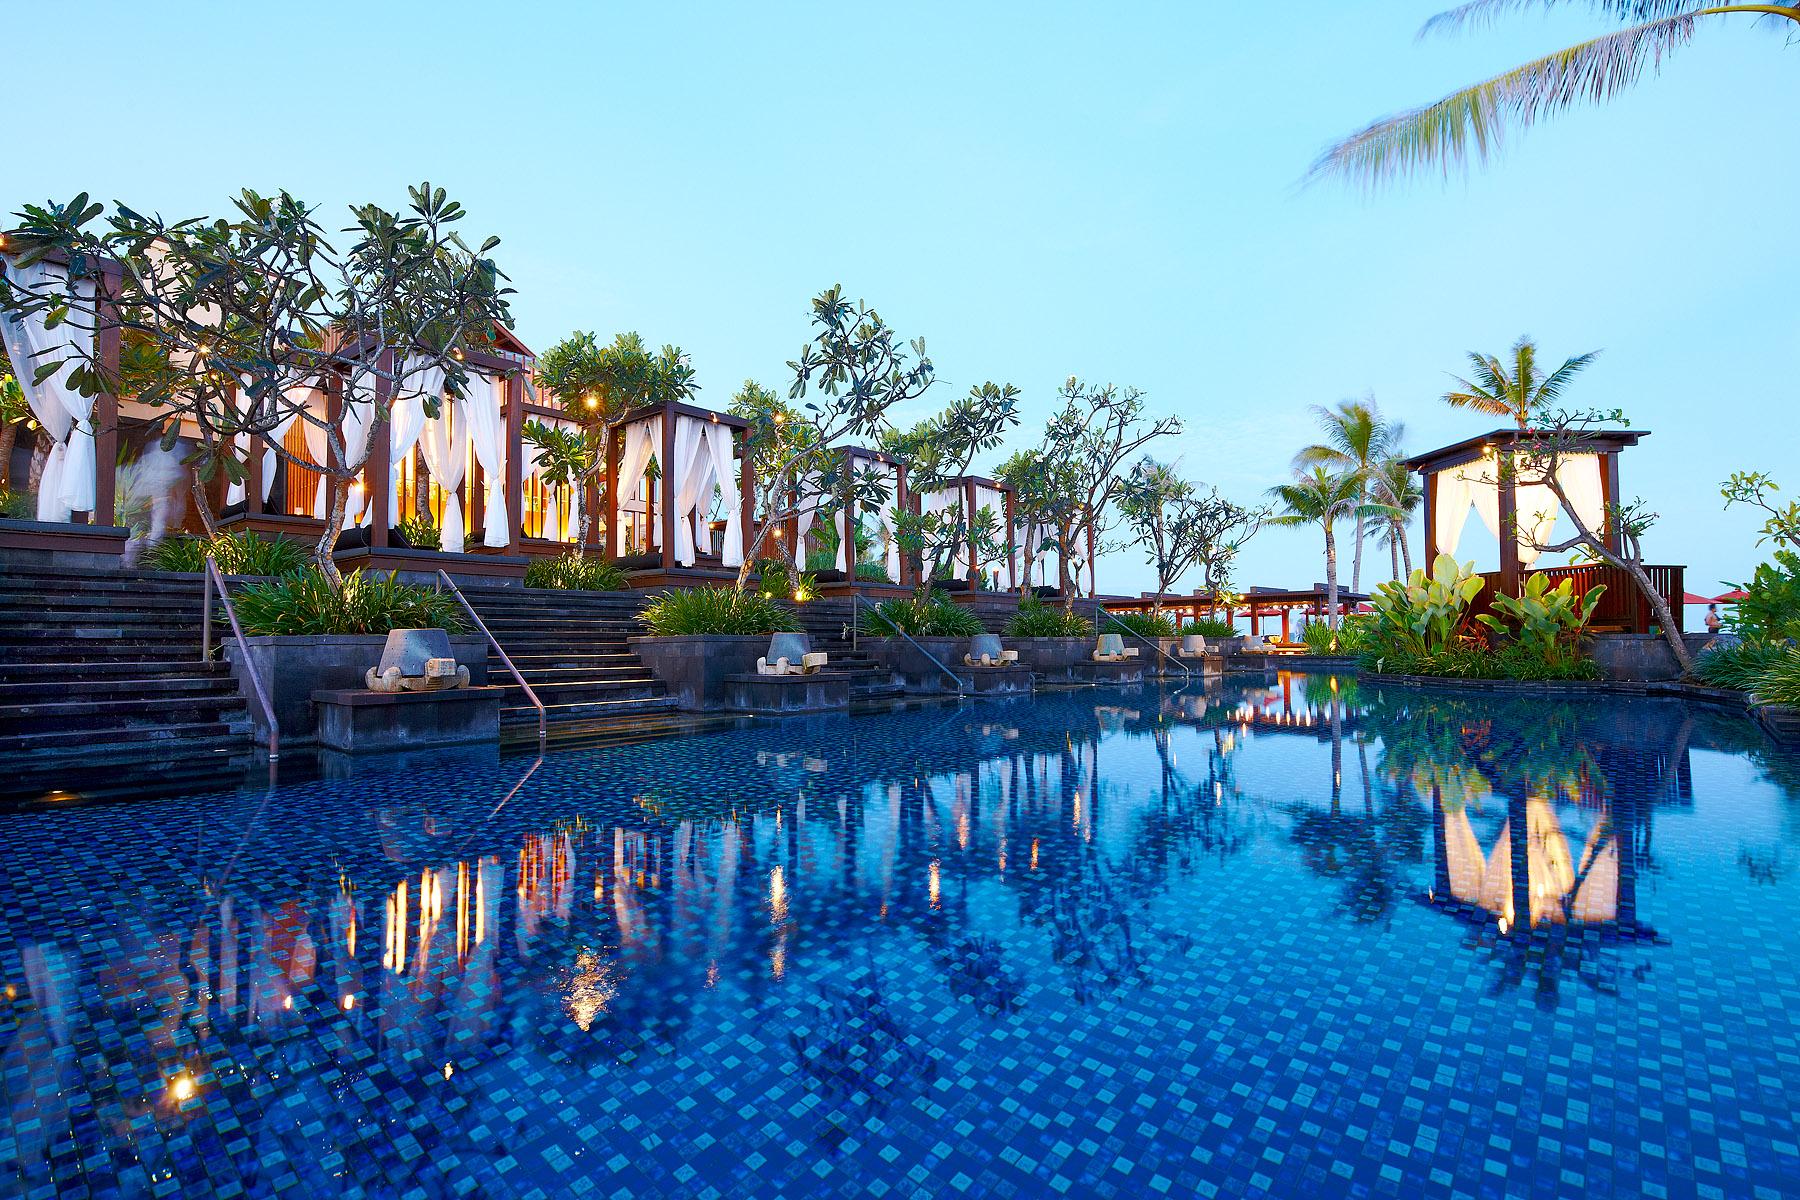 The st regis hotel nusa dua bali the jetsetting fashionista for Hotel bali resort